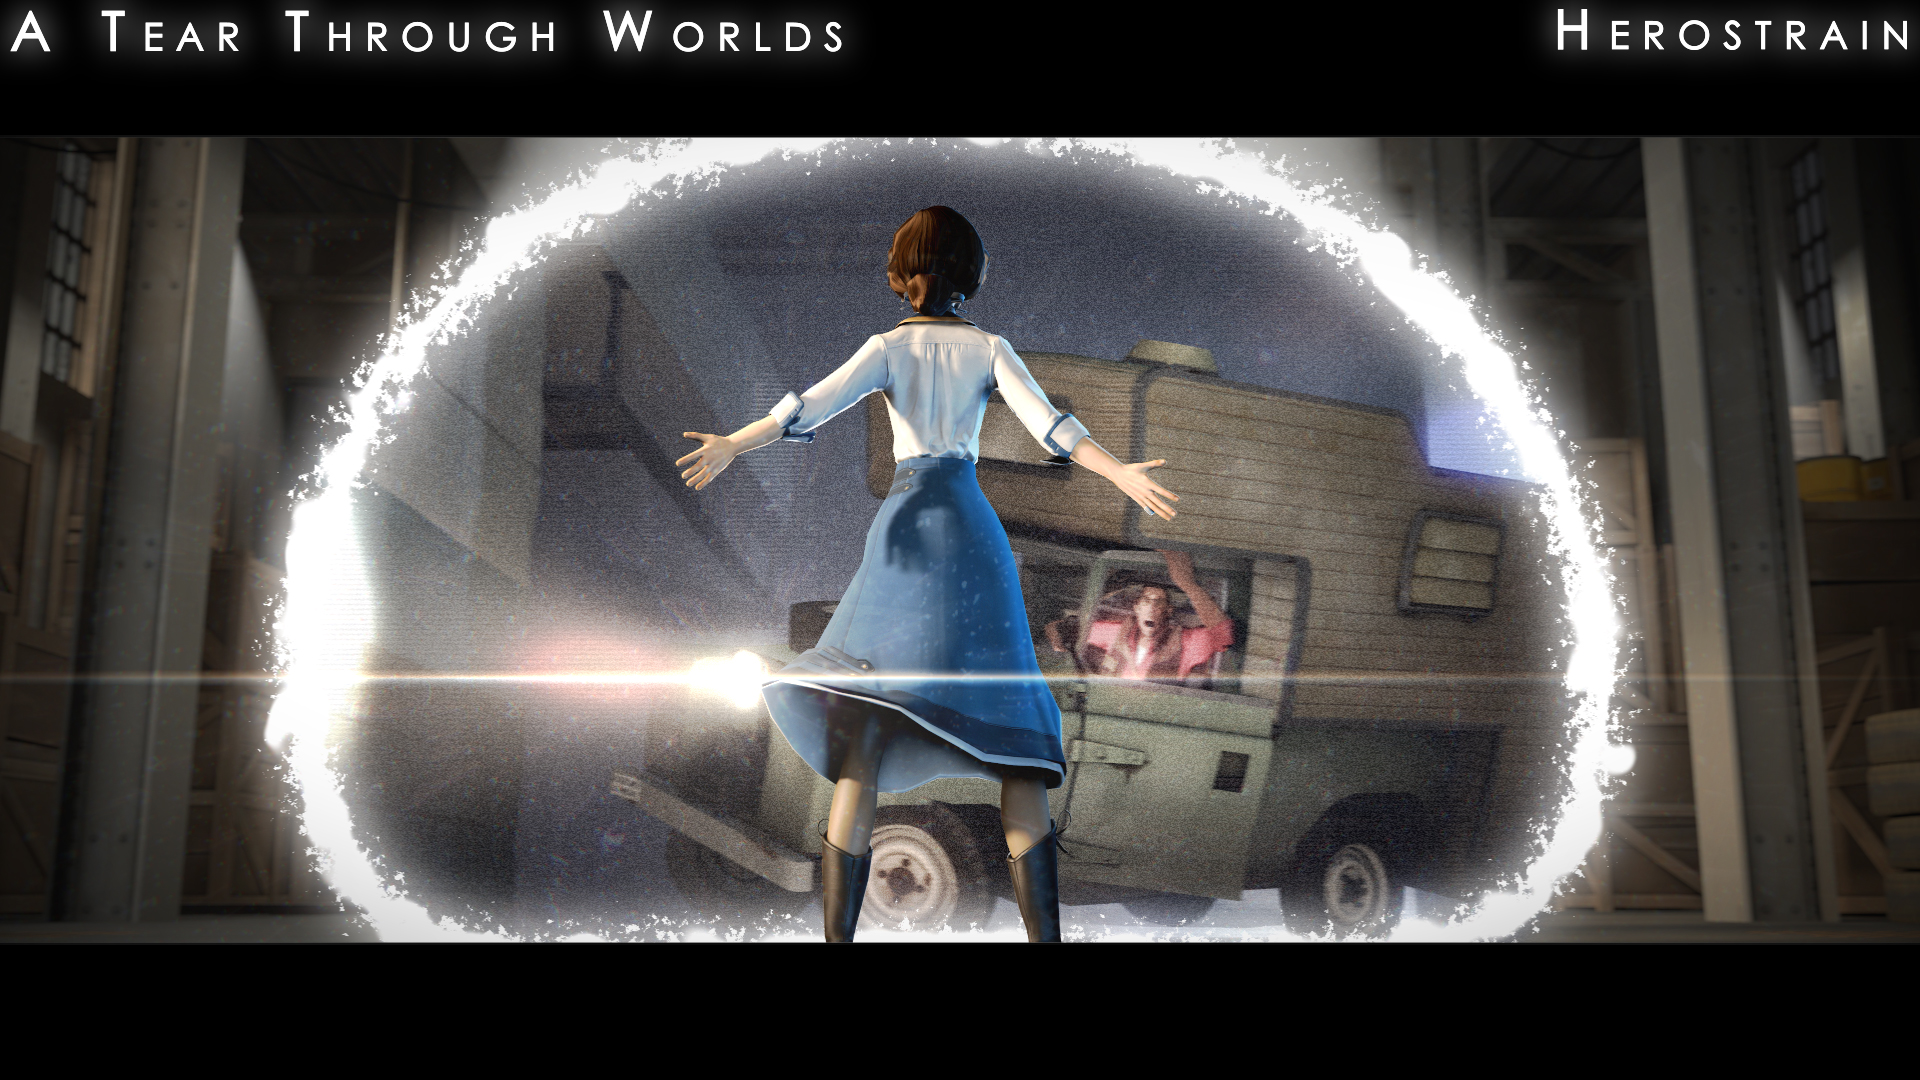 A Tear Through Worlds by Herostrain